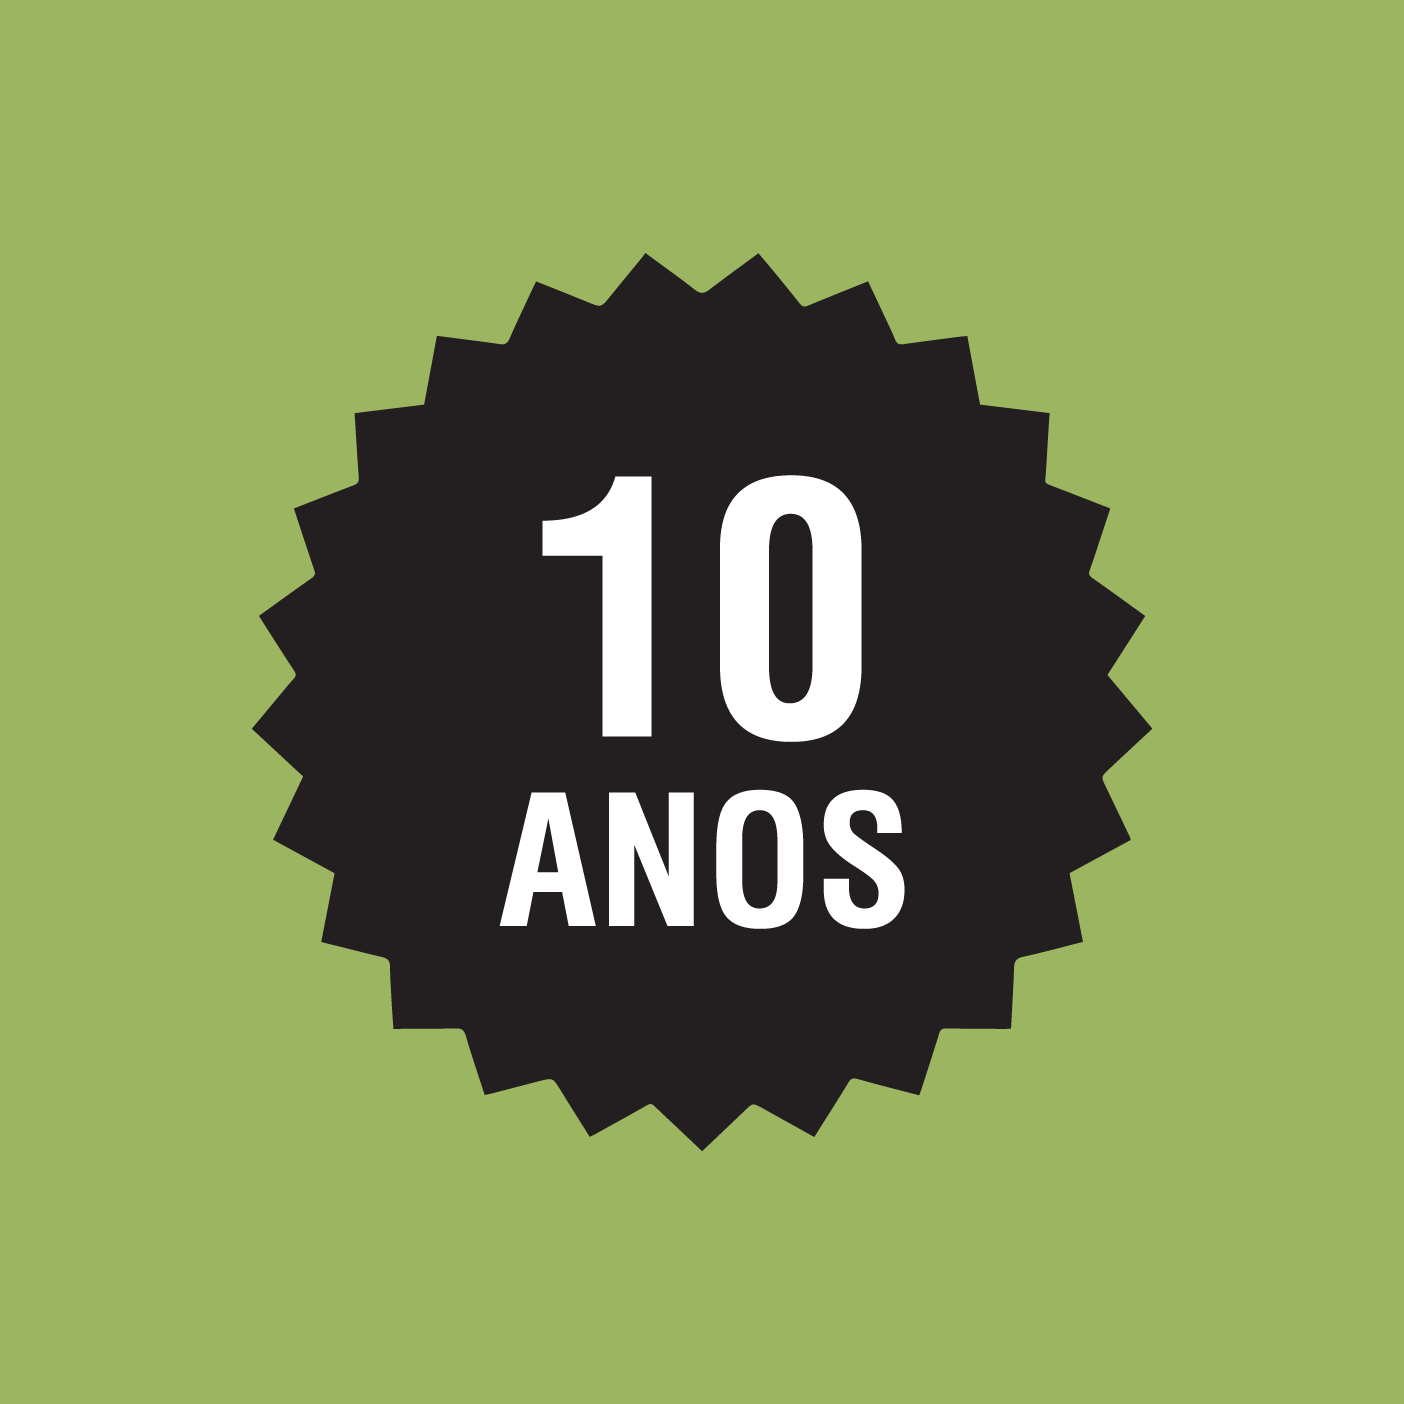 10anoscomfundoverde.png